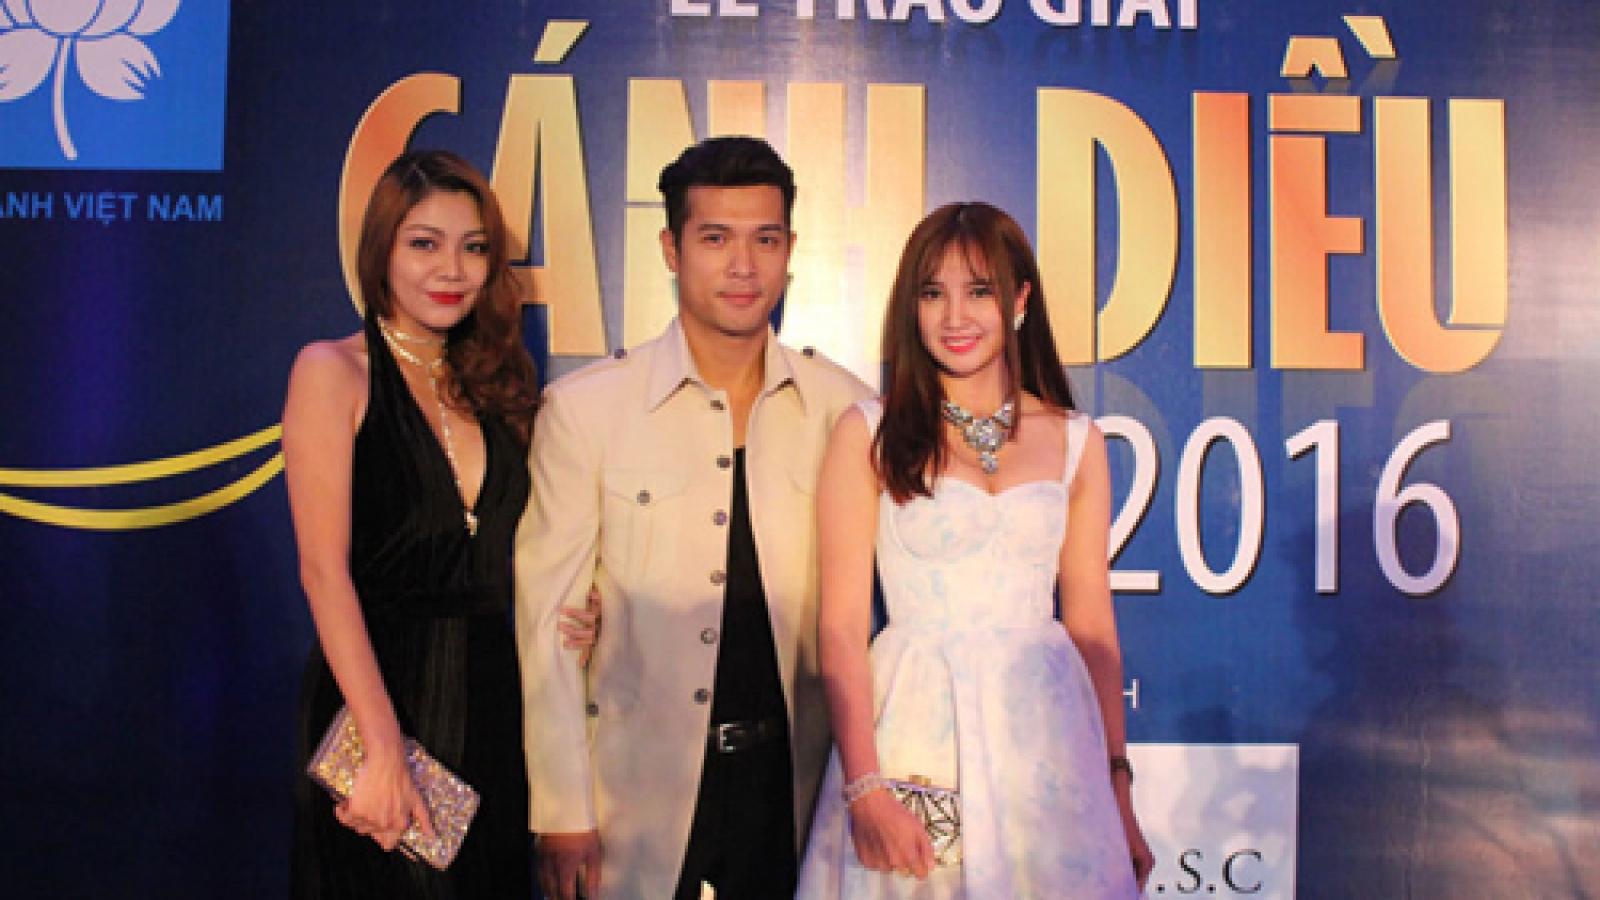 Celebrities attend Golden Kite Awards ceremony